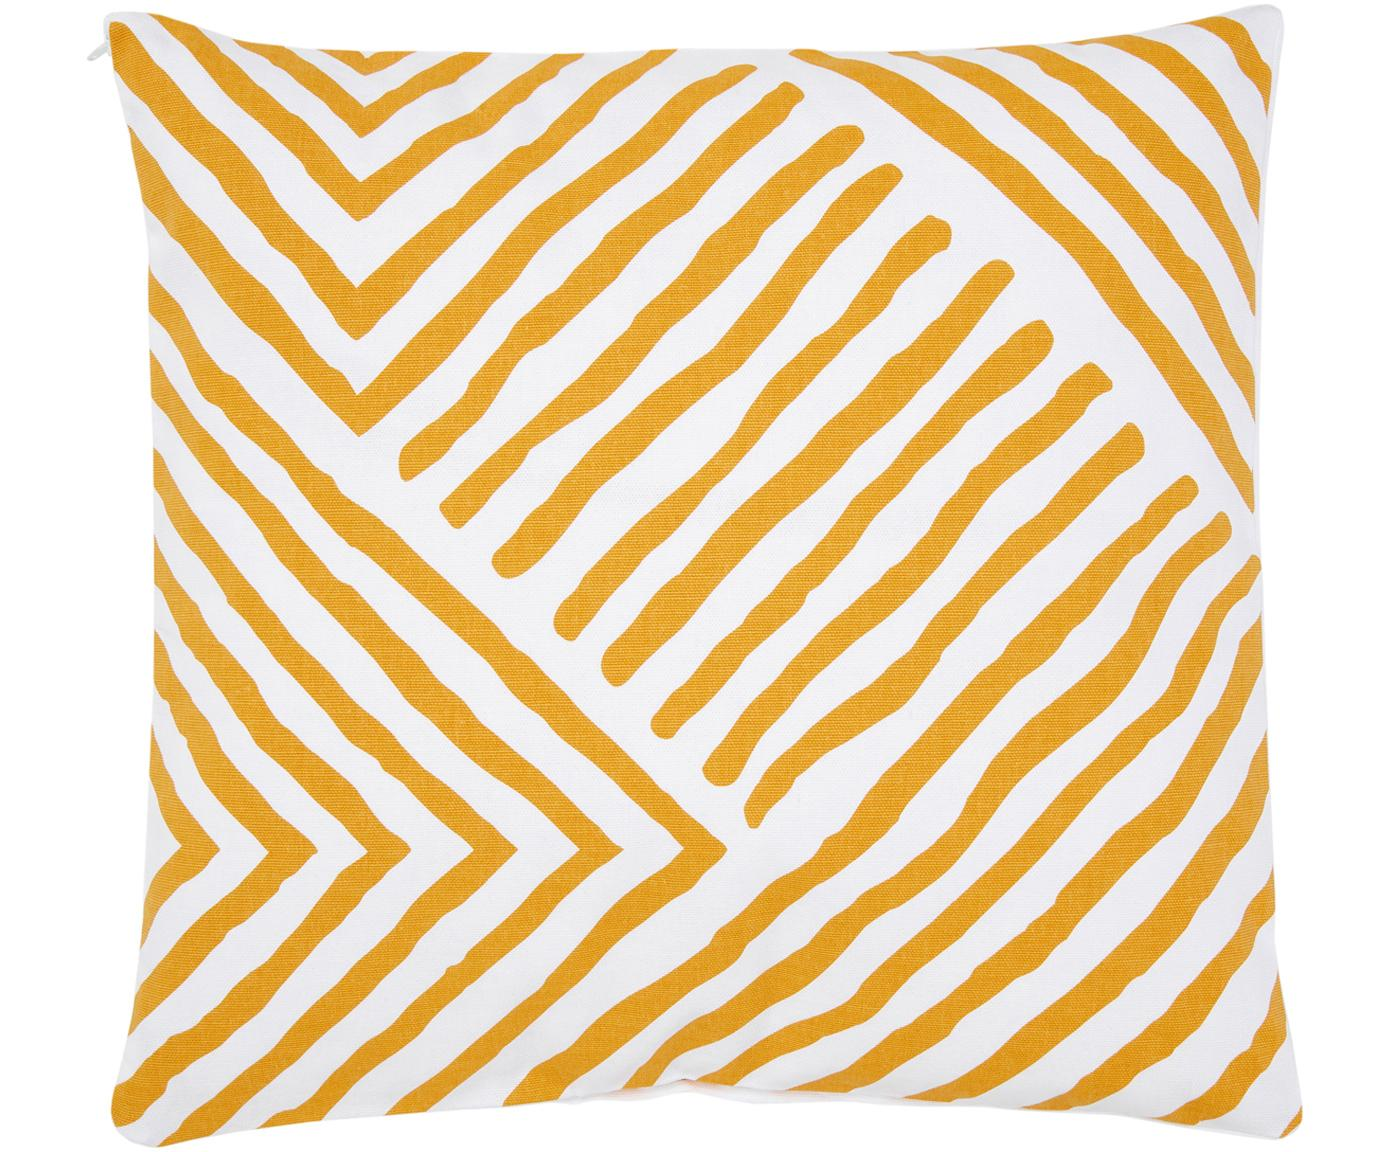 Gemusterte Kissenhülle Mia, 100% Baumwolle, Gelb-Orange, Weiss, 40 x 40 cm